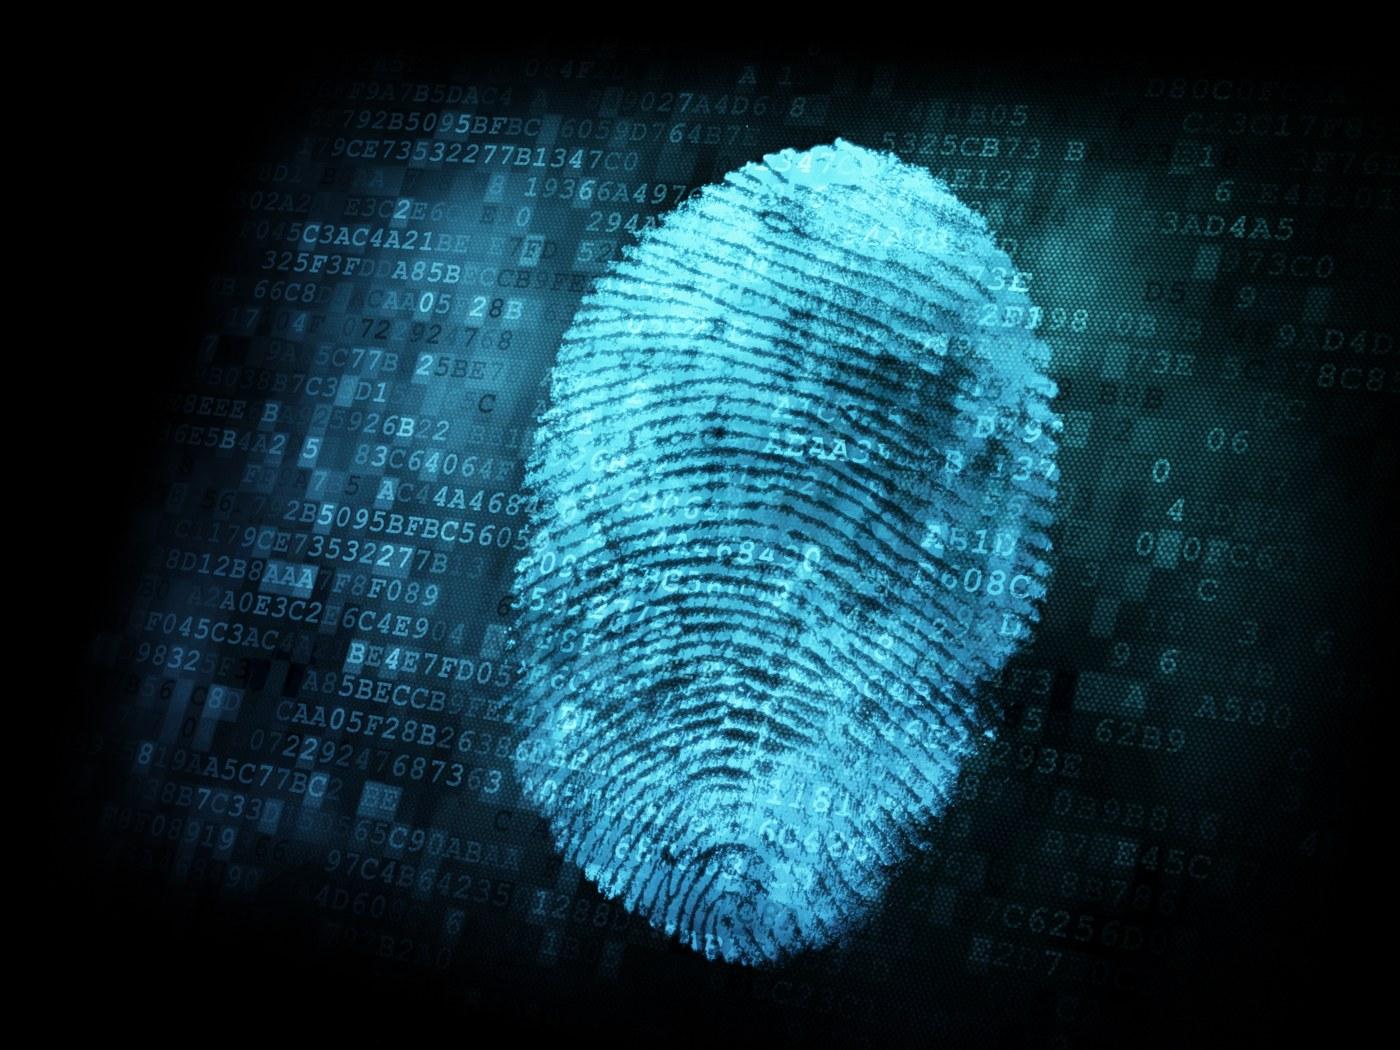 DeepMarks: A Digital Fingerprinting Framework for Deep Neural Networks